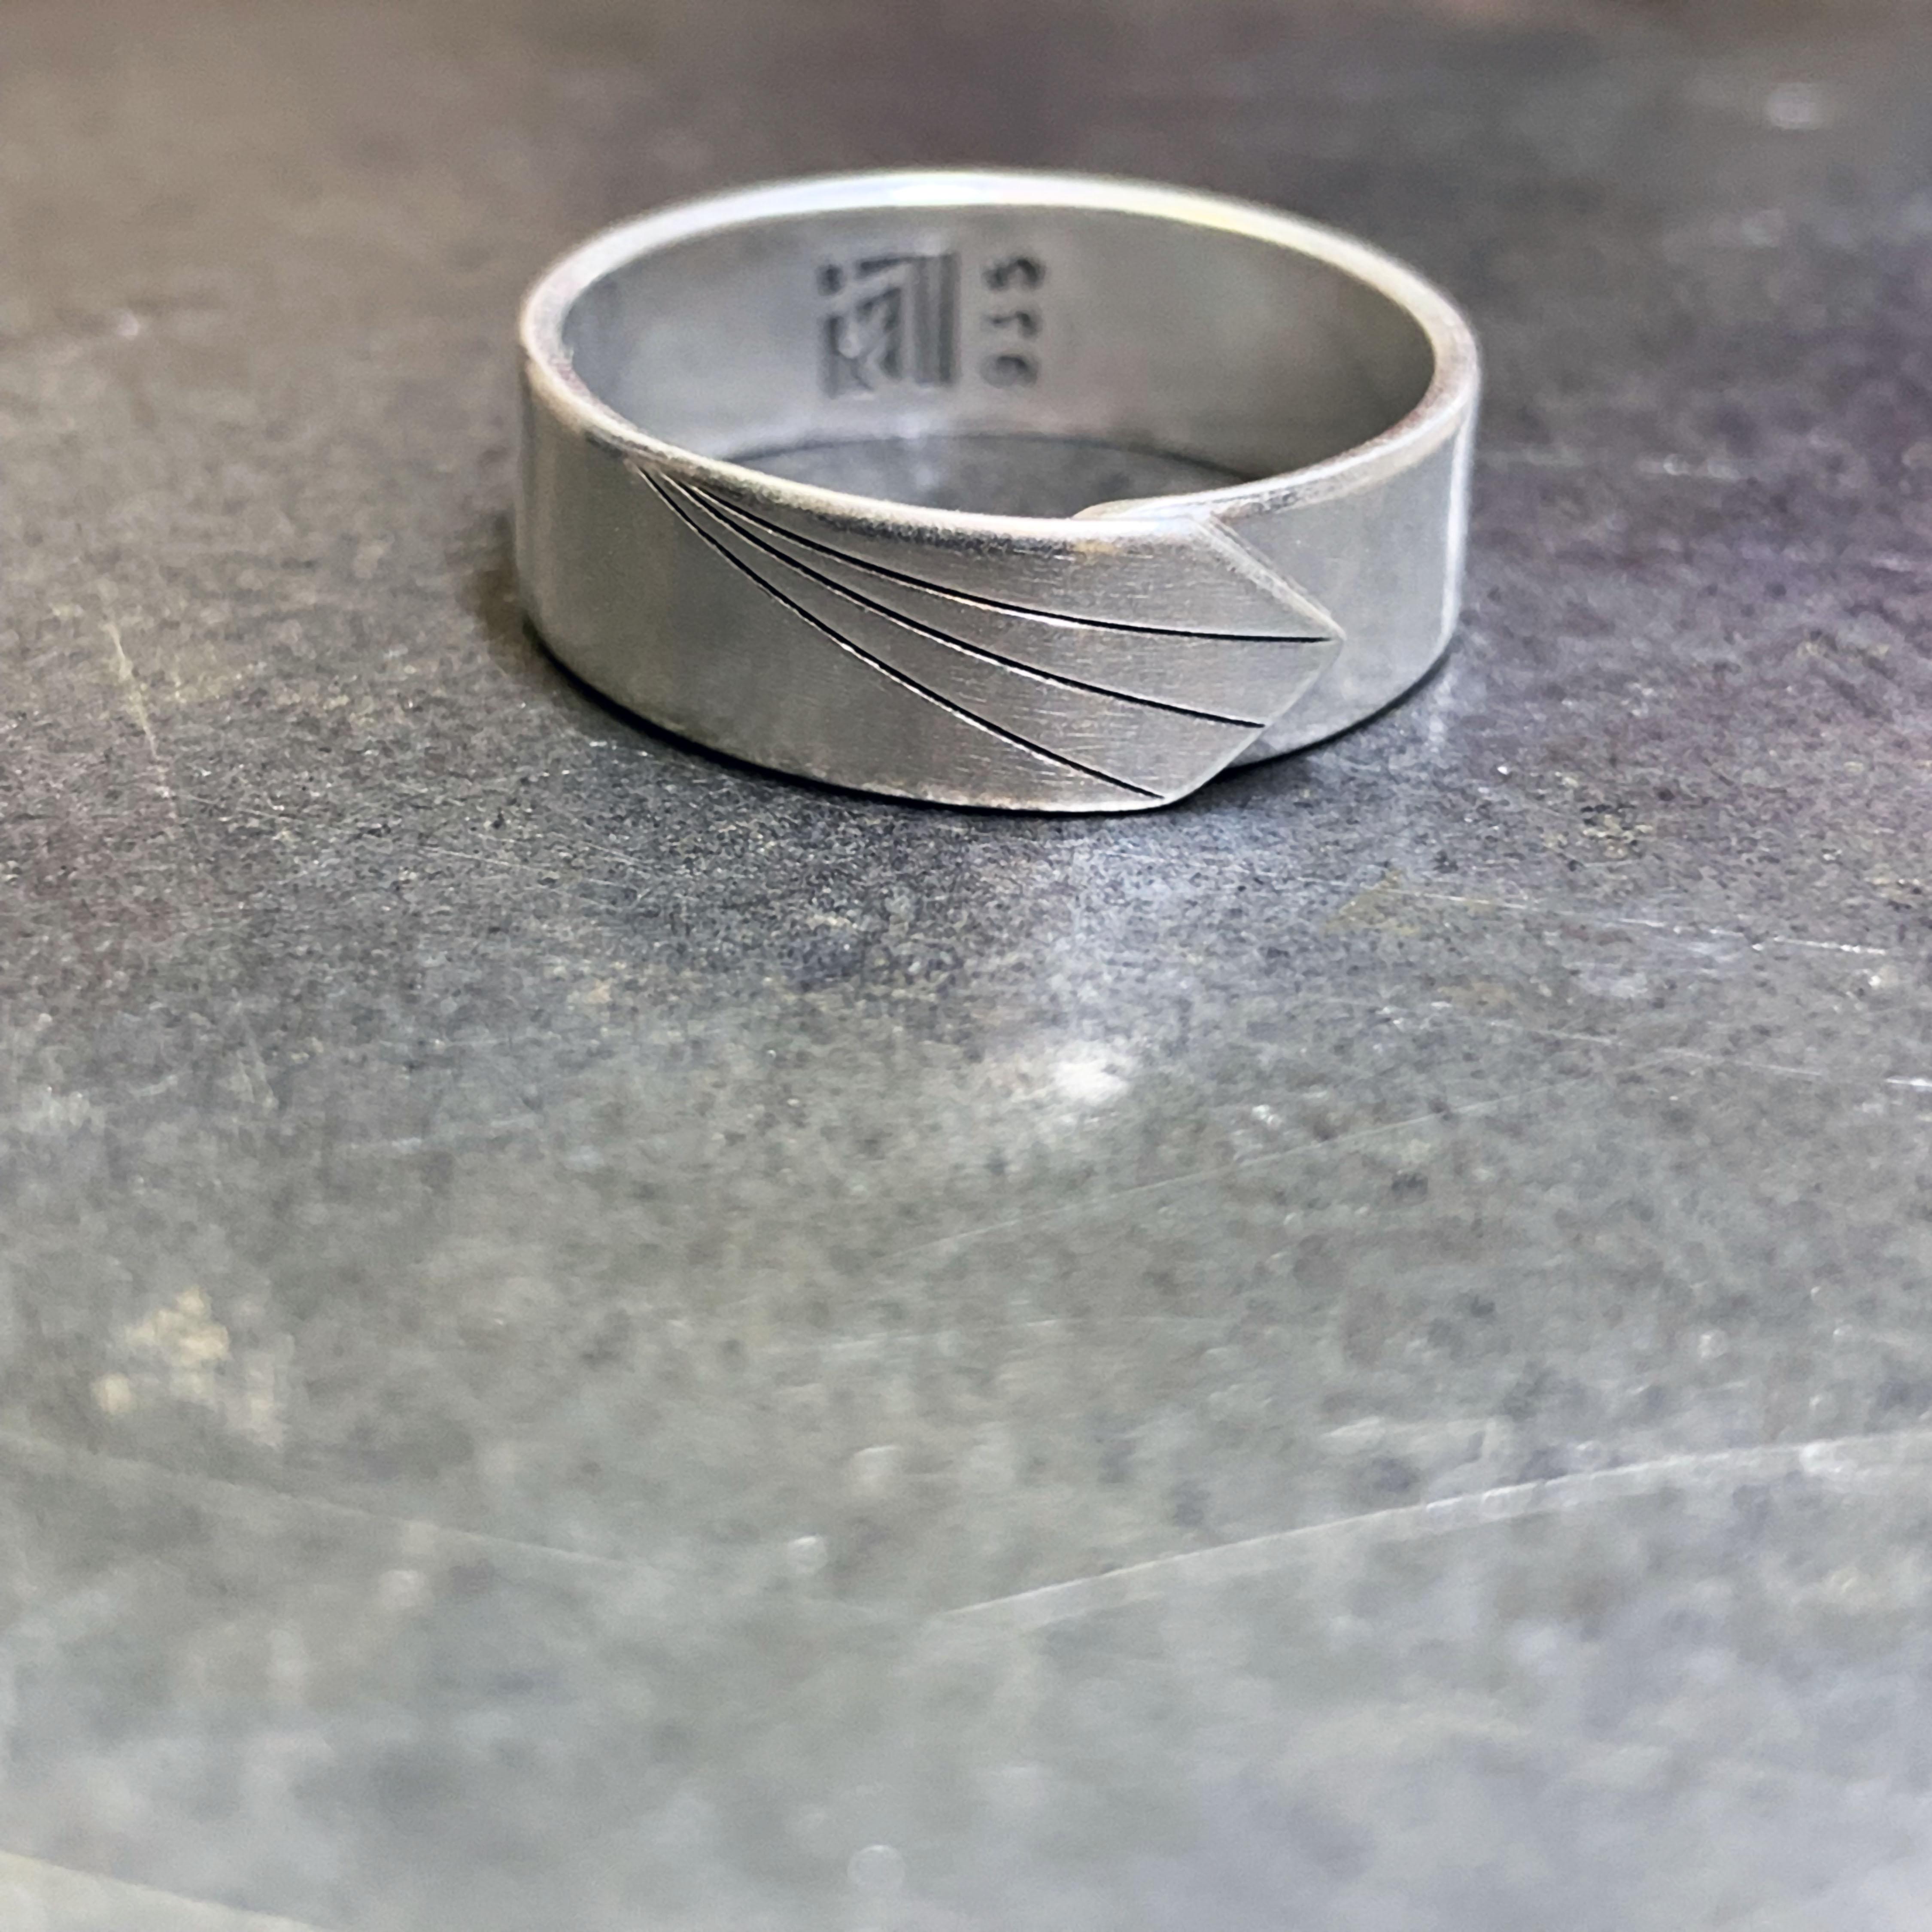 Skinny version New beginning silver ring – Vision